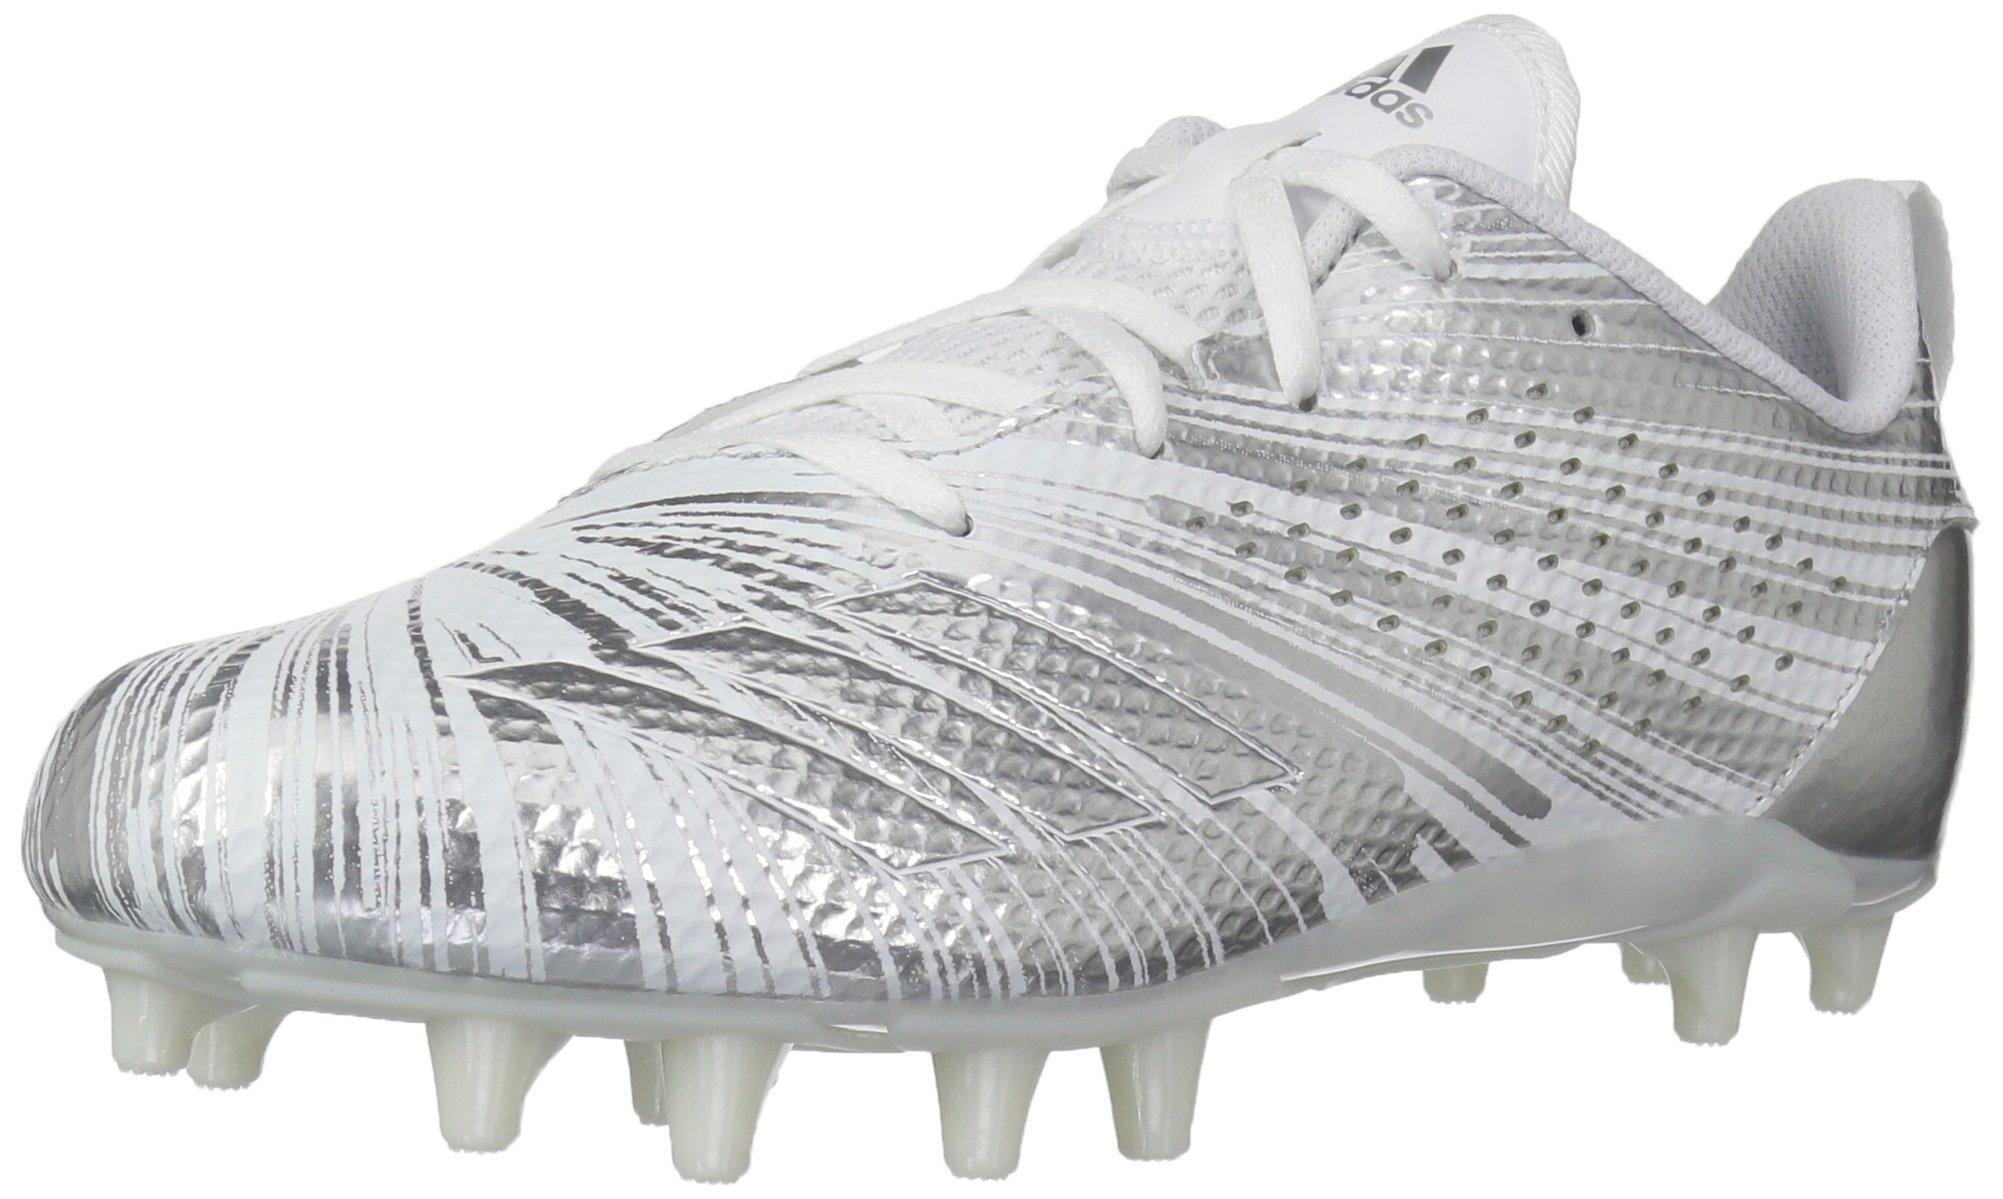 adidas Boys' Adizero 5.5Star 7.0 Football Shoe, Silver Metallic/White, 1.5 M US Little Kid